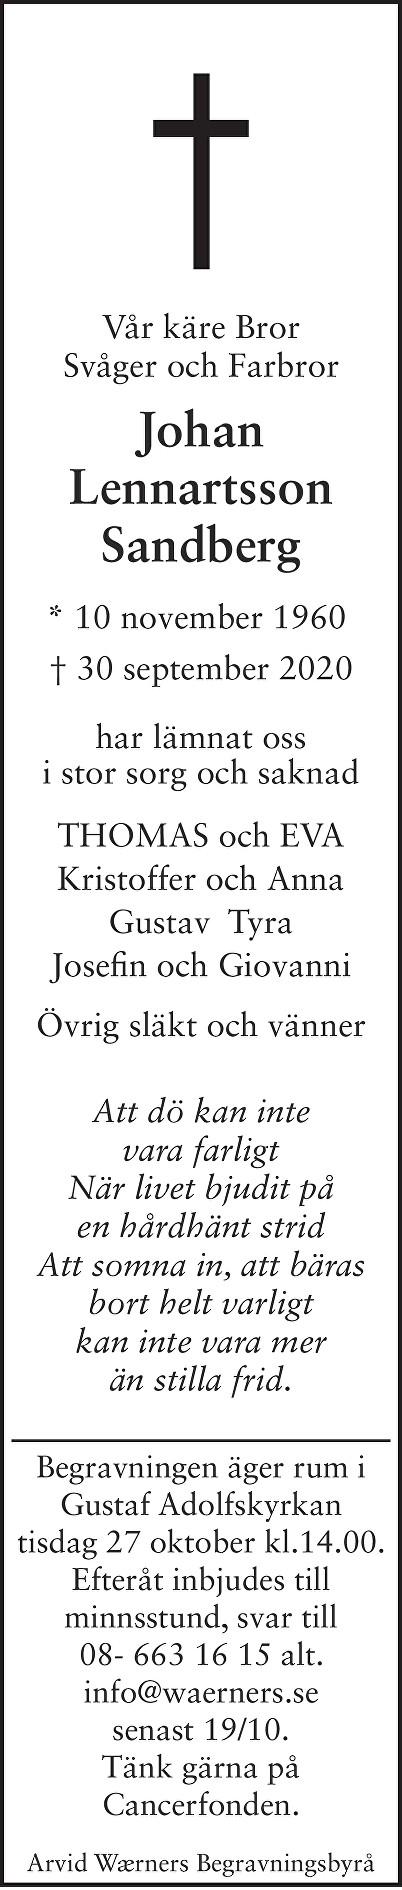 Johan Lennartsson Sandberg Death notice